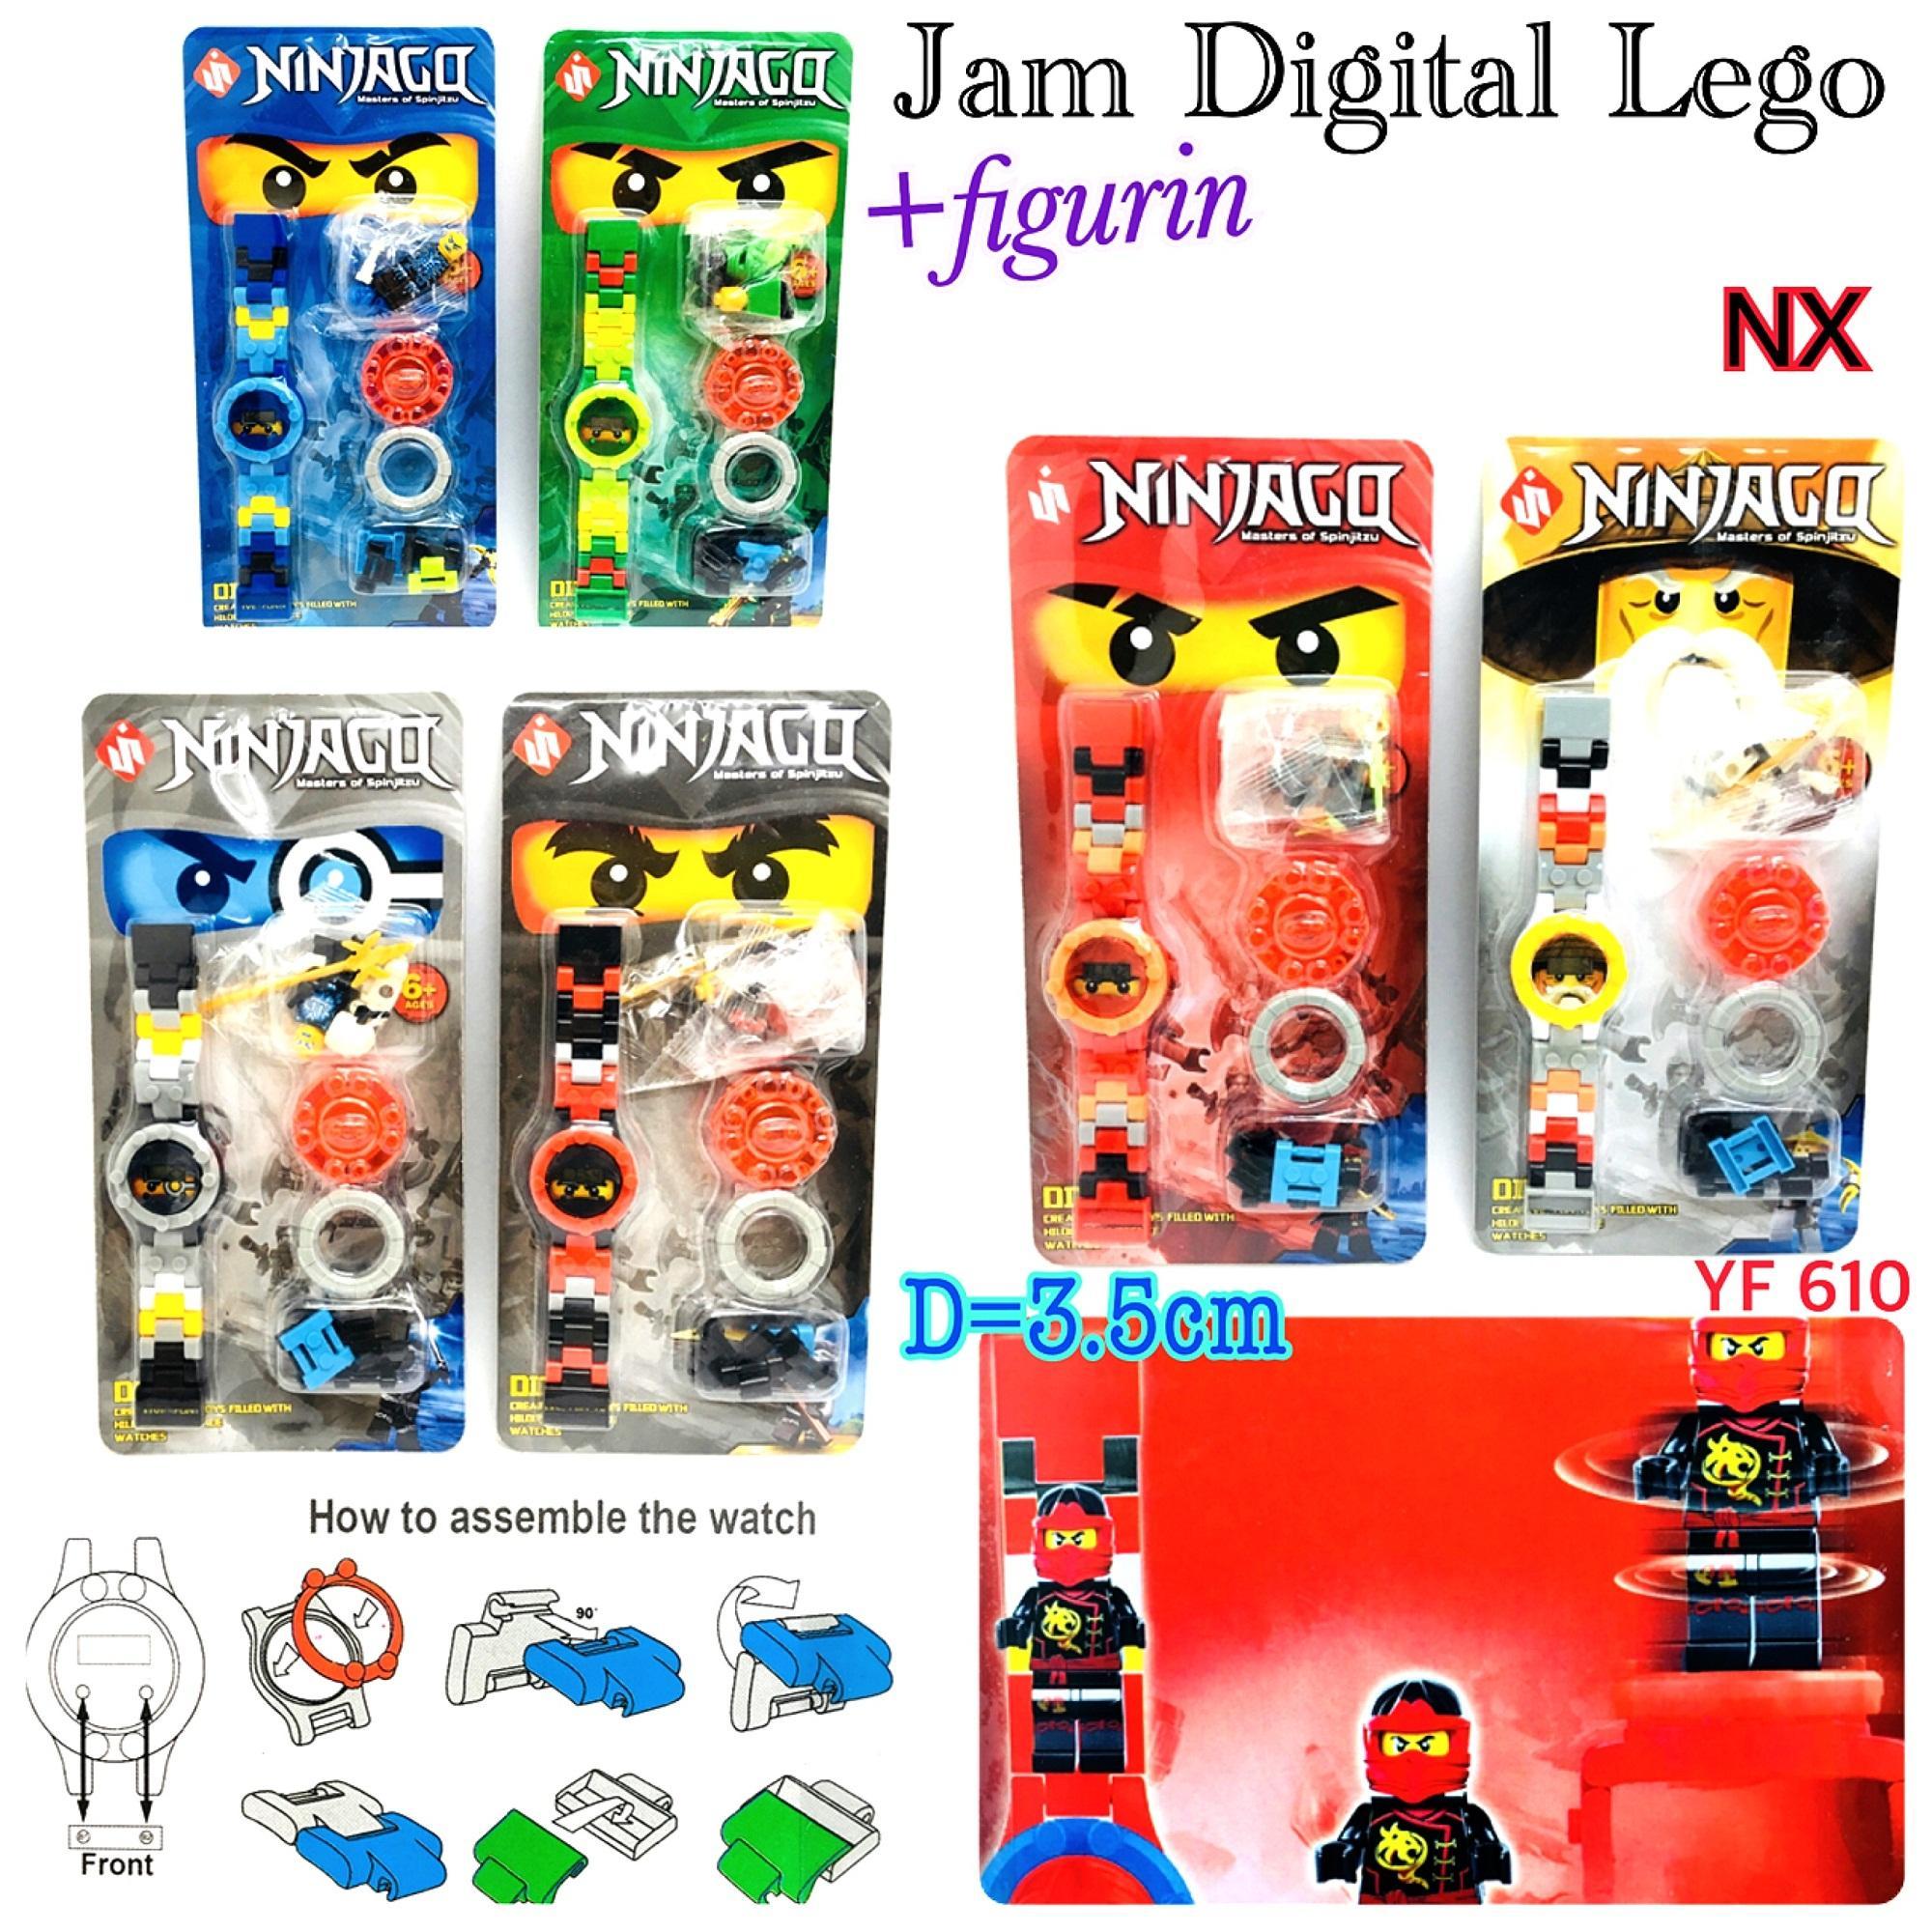 Harga Sale Jam Tangan Anak Mainan Multifungsi Lego Super Heroes Hulk Kardus Box Packing Rmz Aksesoris Alat Tulis Kantor Accesoris Hp Digital Plus Figurin Ninja Go